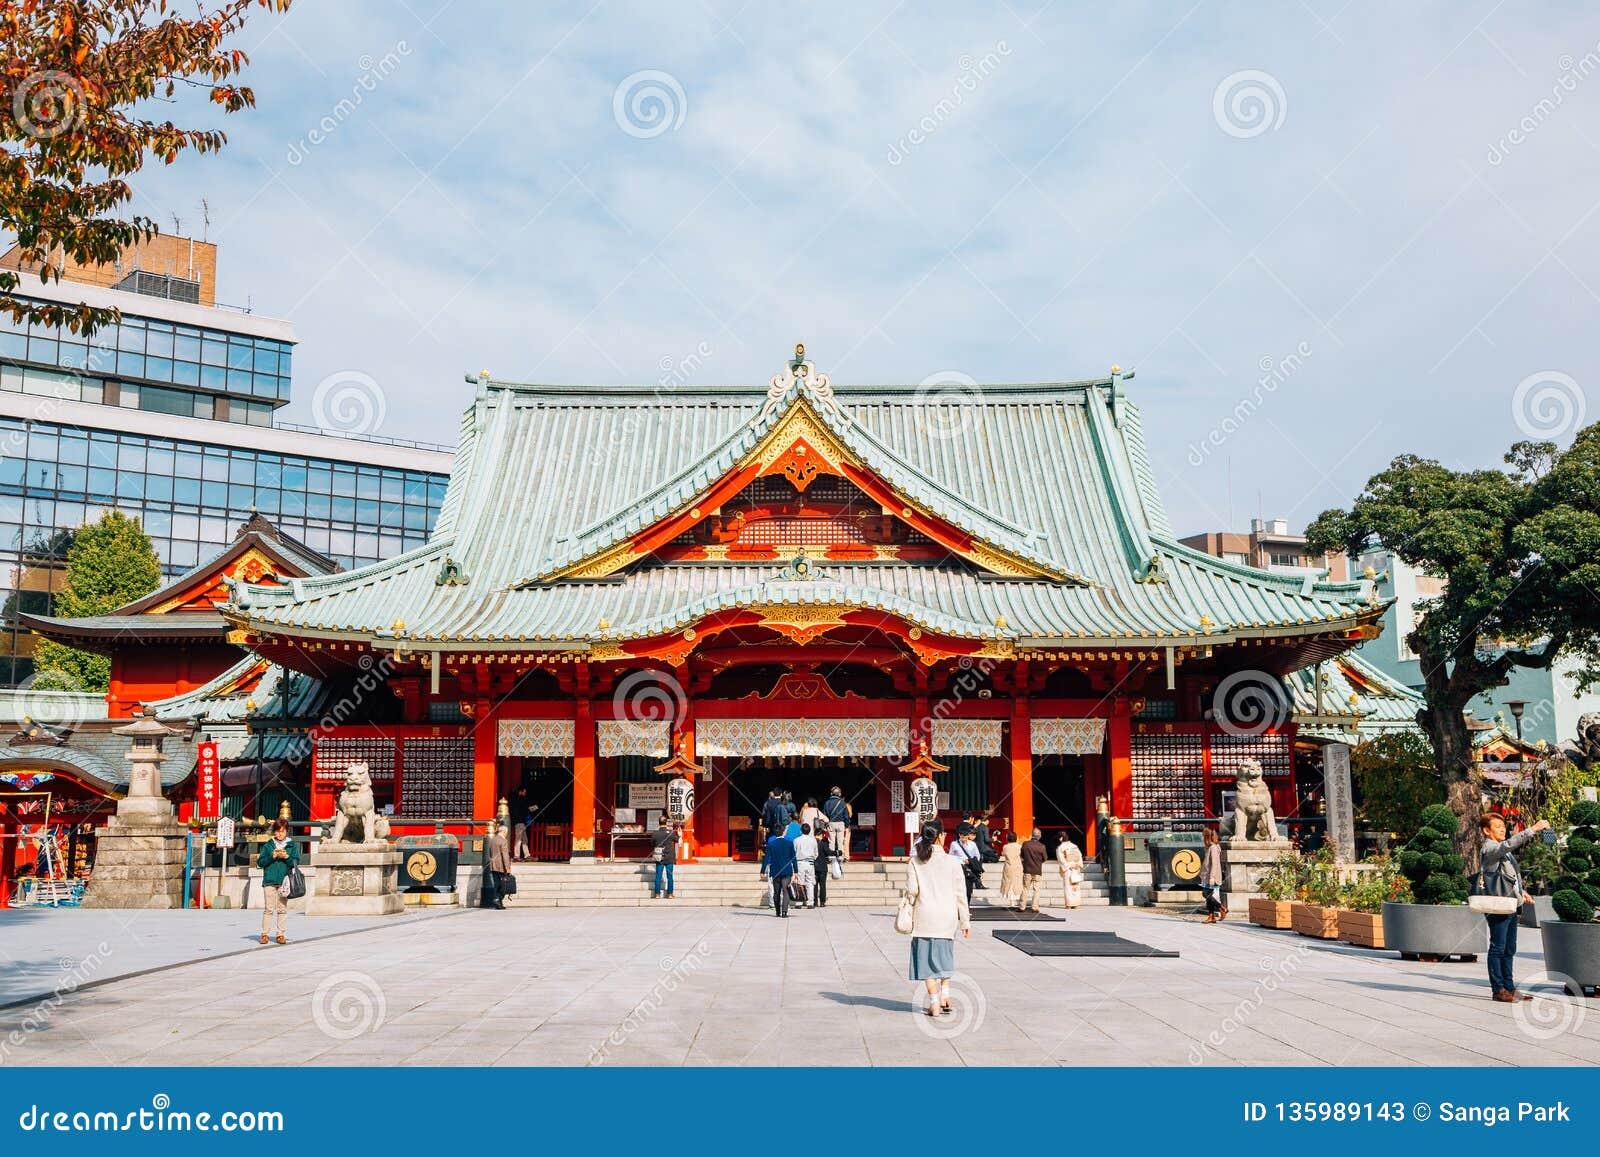 Kanda Shrine traditional architecture in Tokyo, Japan